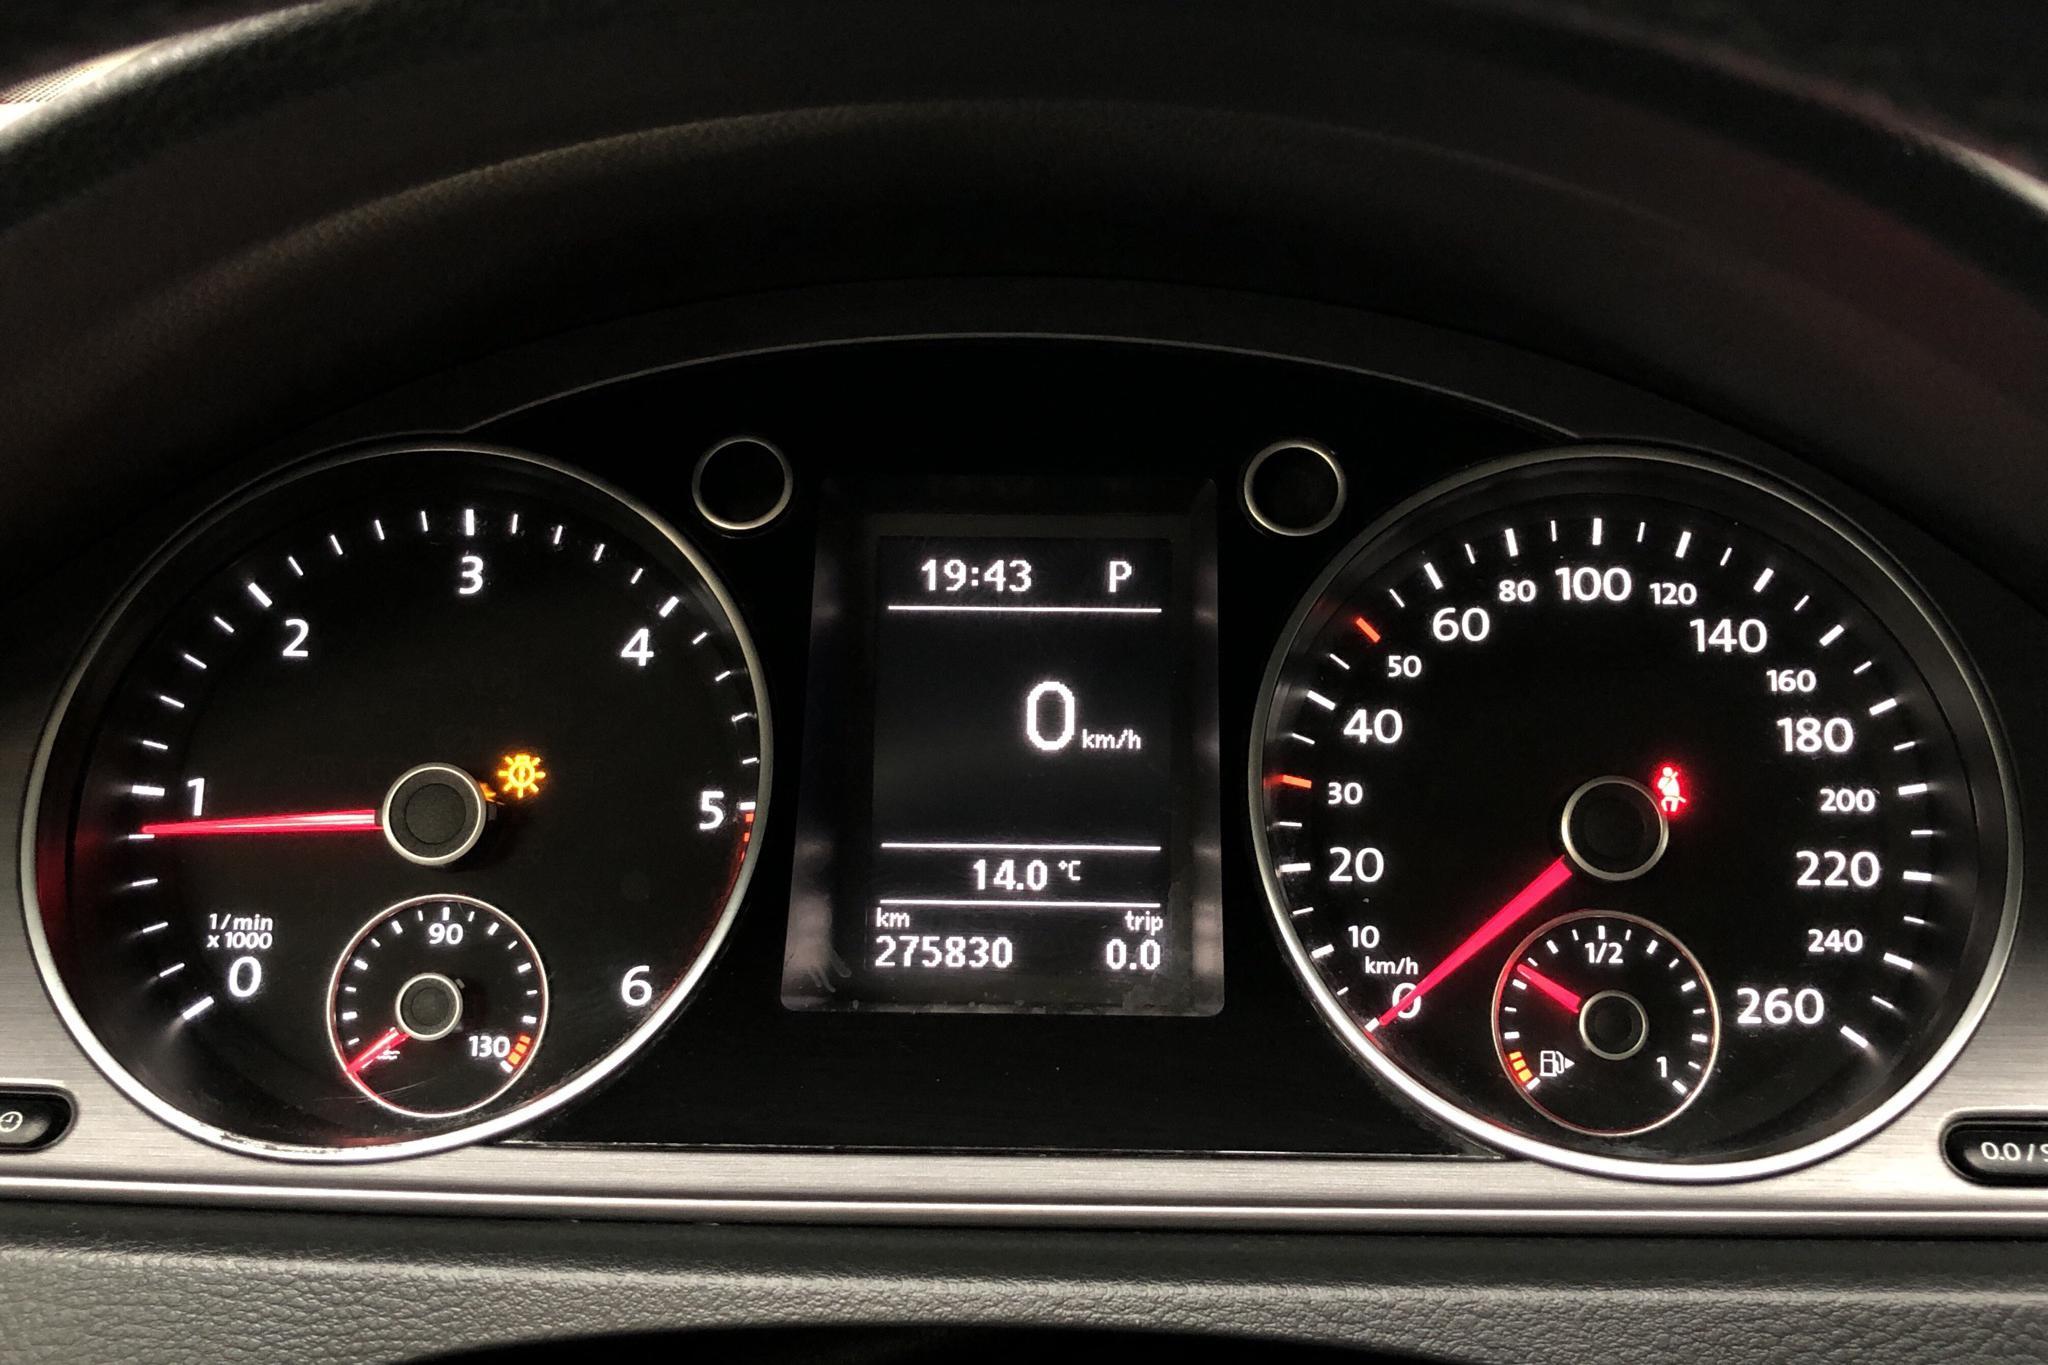 VW Passat 2.0 TDI BlueMotion Technology Variant (170hk) - 27 583 mil - Automat - Dark Grey - 2013